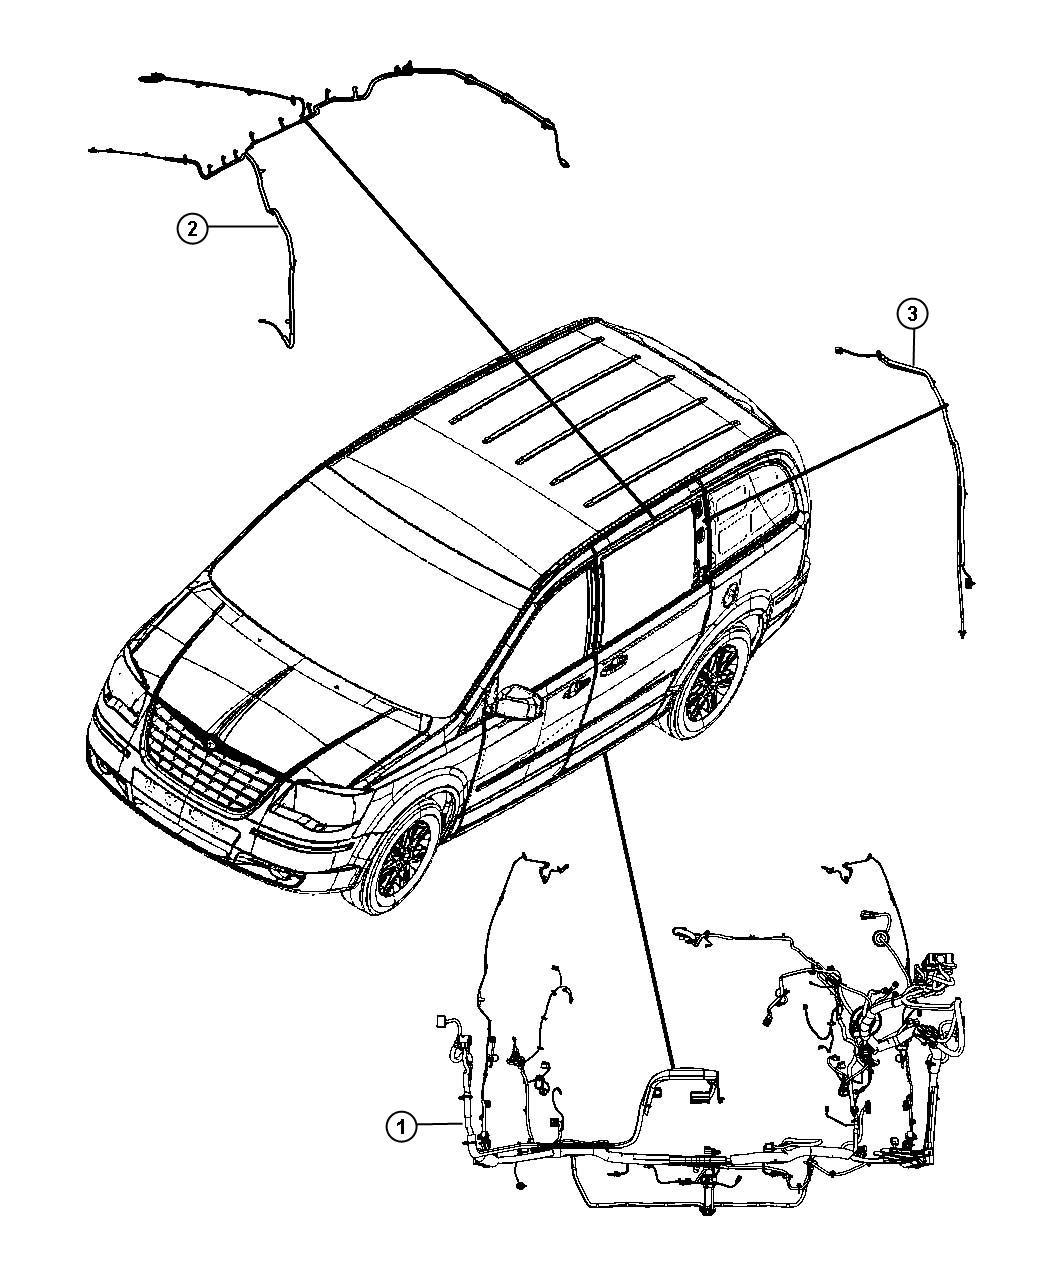 Dodge Grand Caravan Wiring. Body. [pwr windows, frt/rear